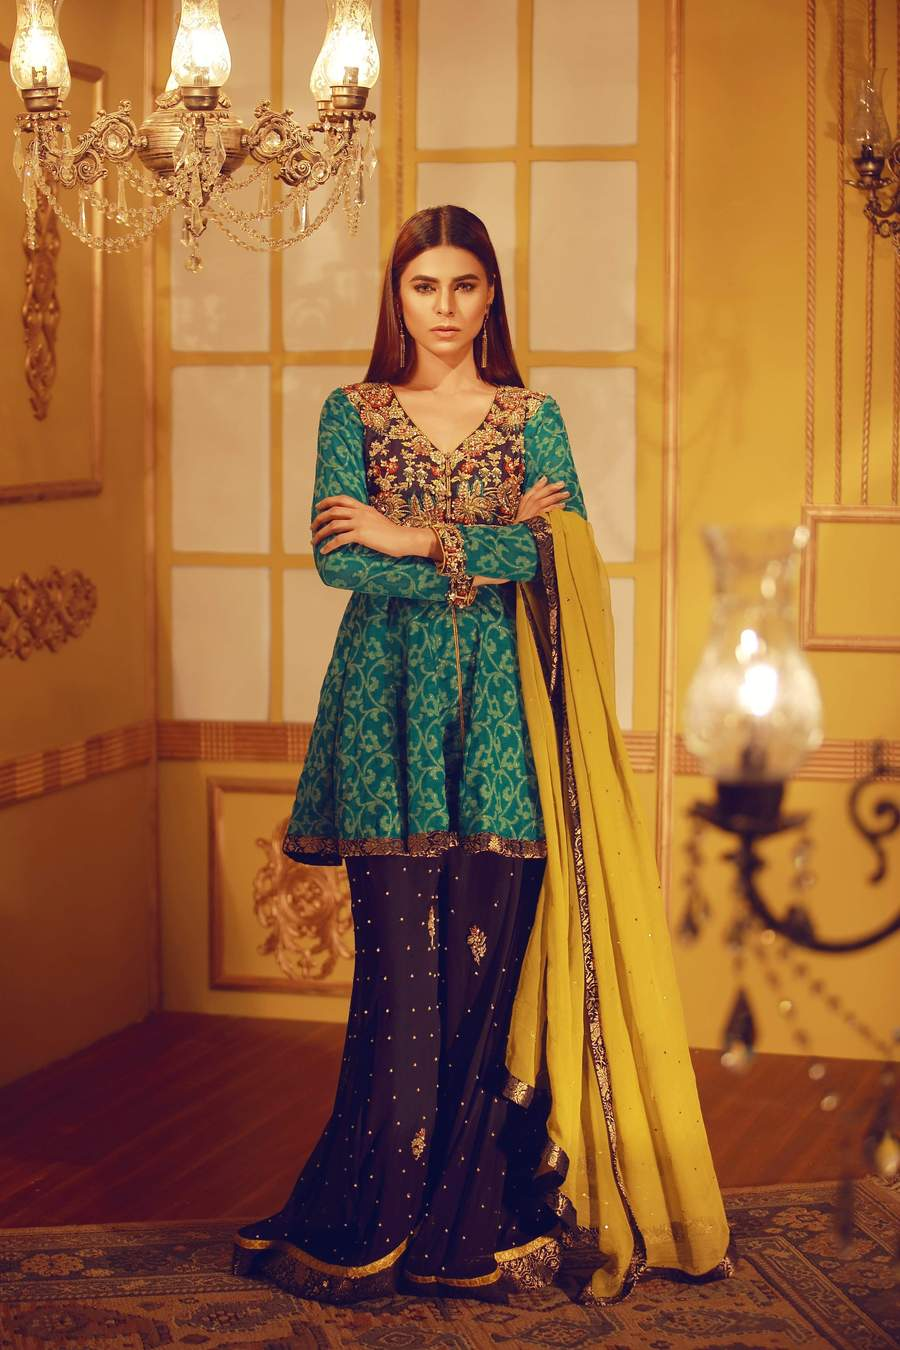 Mehndi Dresses by Sarosh Salman features this Khaadi Chiffon Peplum Top with Resham & Zardozi Work featuring a Palazzo Pants with Warm Olive Dupatta